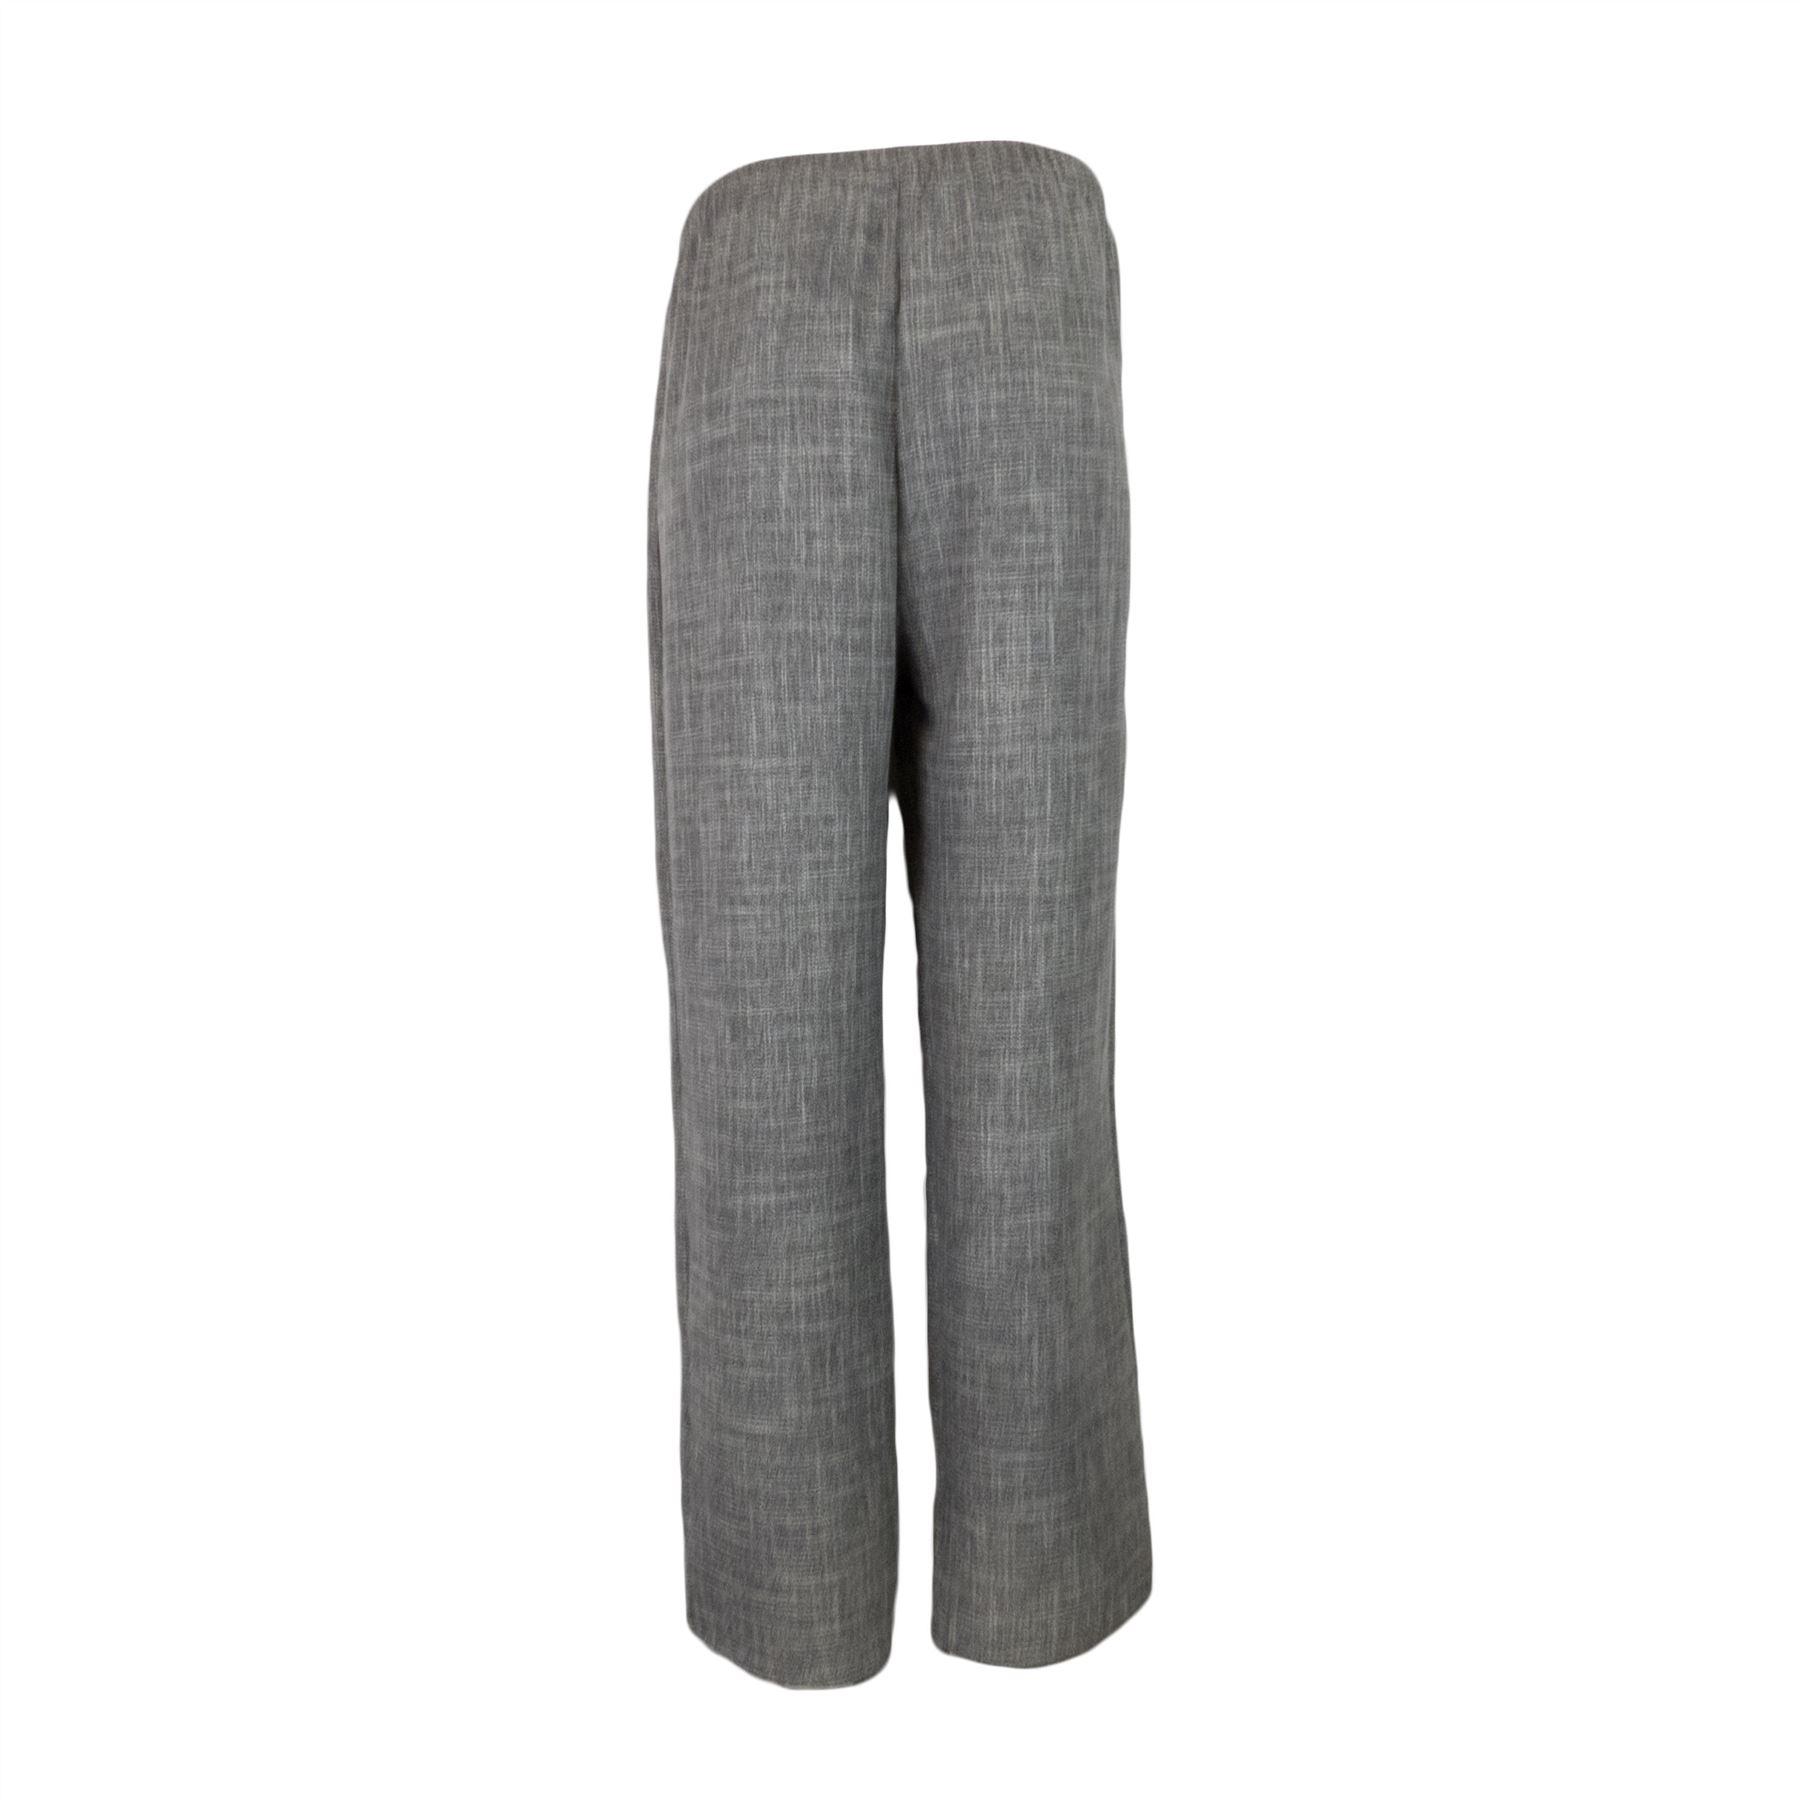 Saloos-Linen-Look-Trouser-Casual-or-Eveningwear-Elasticated-Waist thumbnail 13